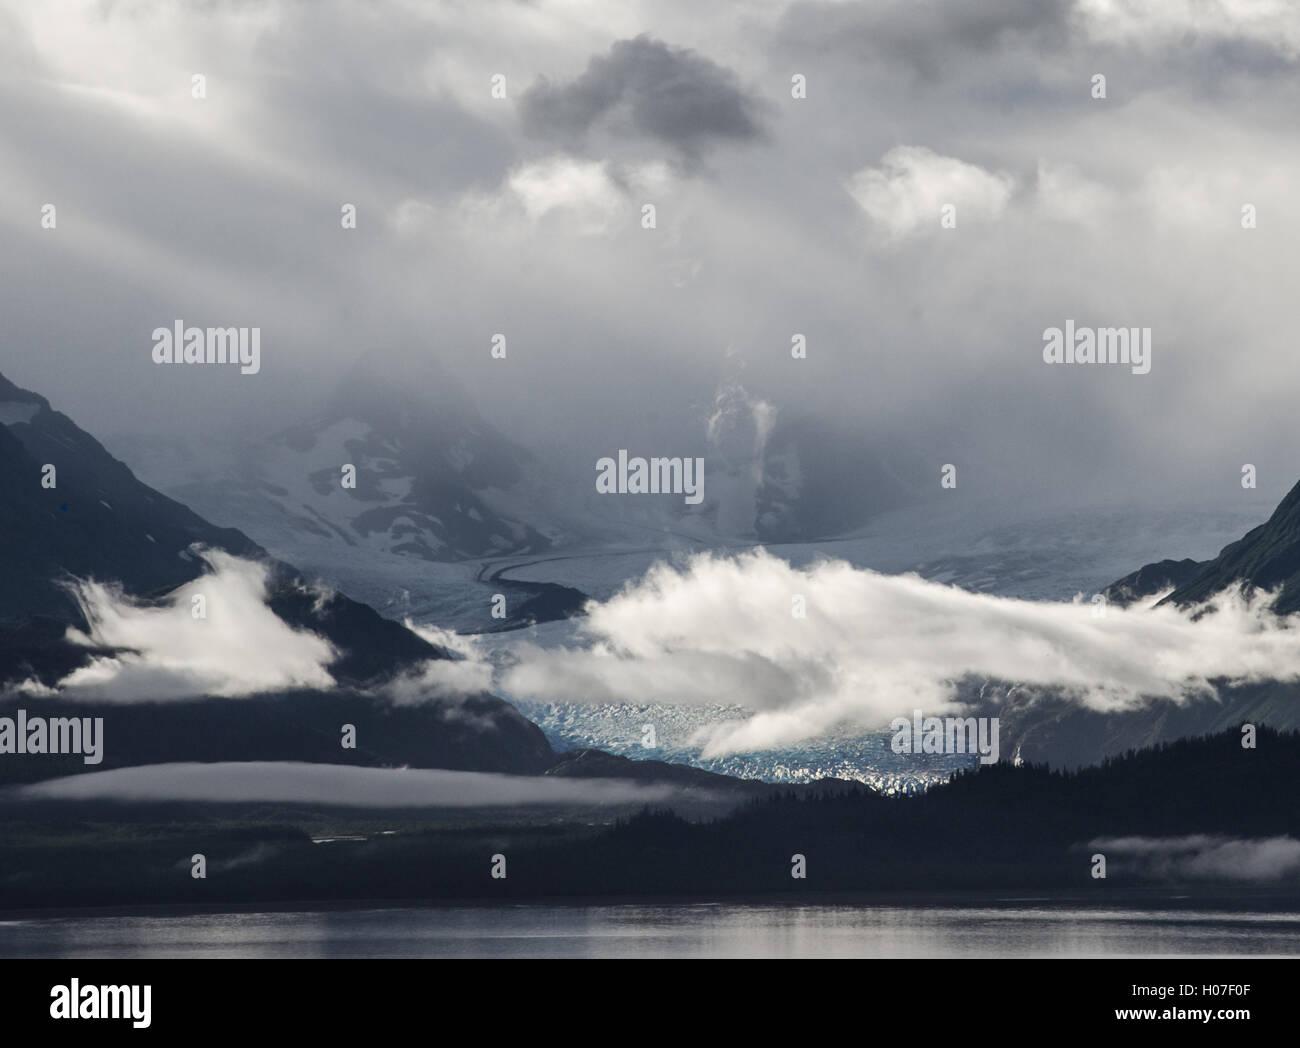 Dawn sun shines on fog and clouds, illuminating Grewingk Glacier. - Stock Image